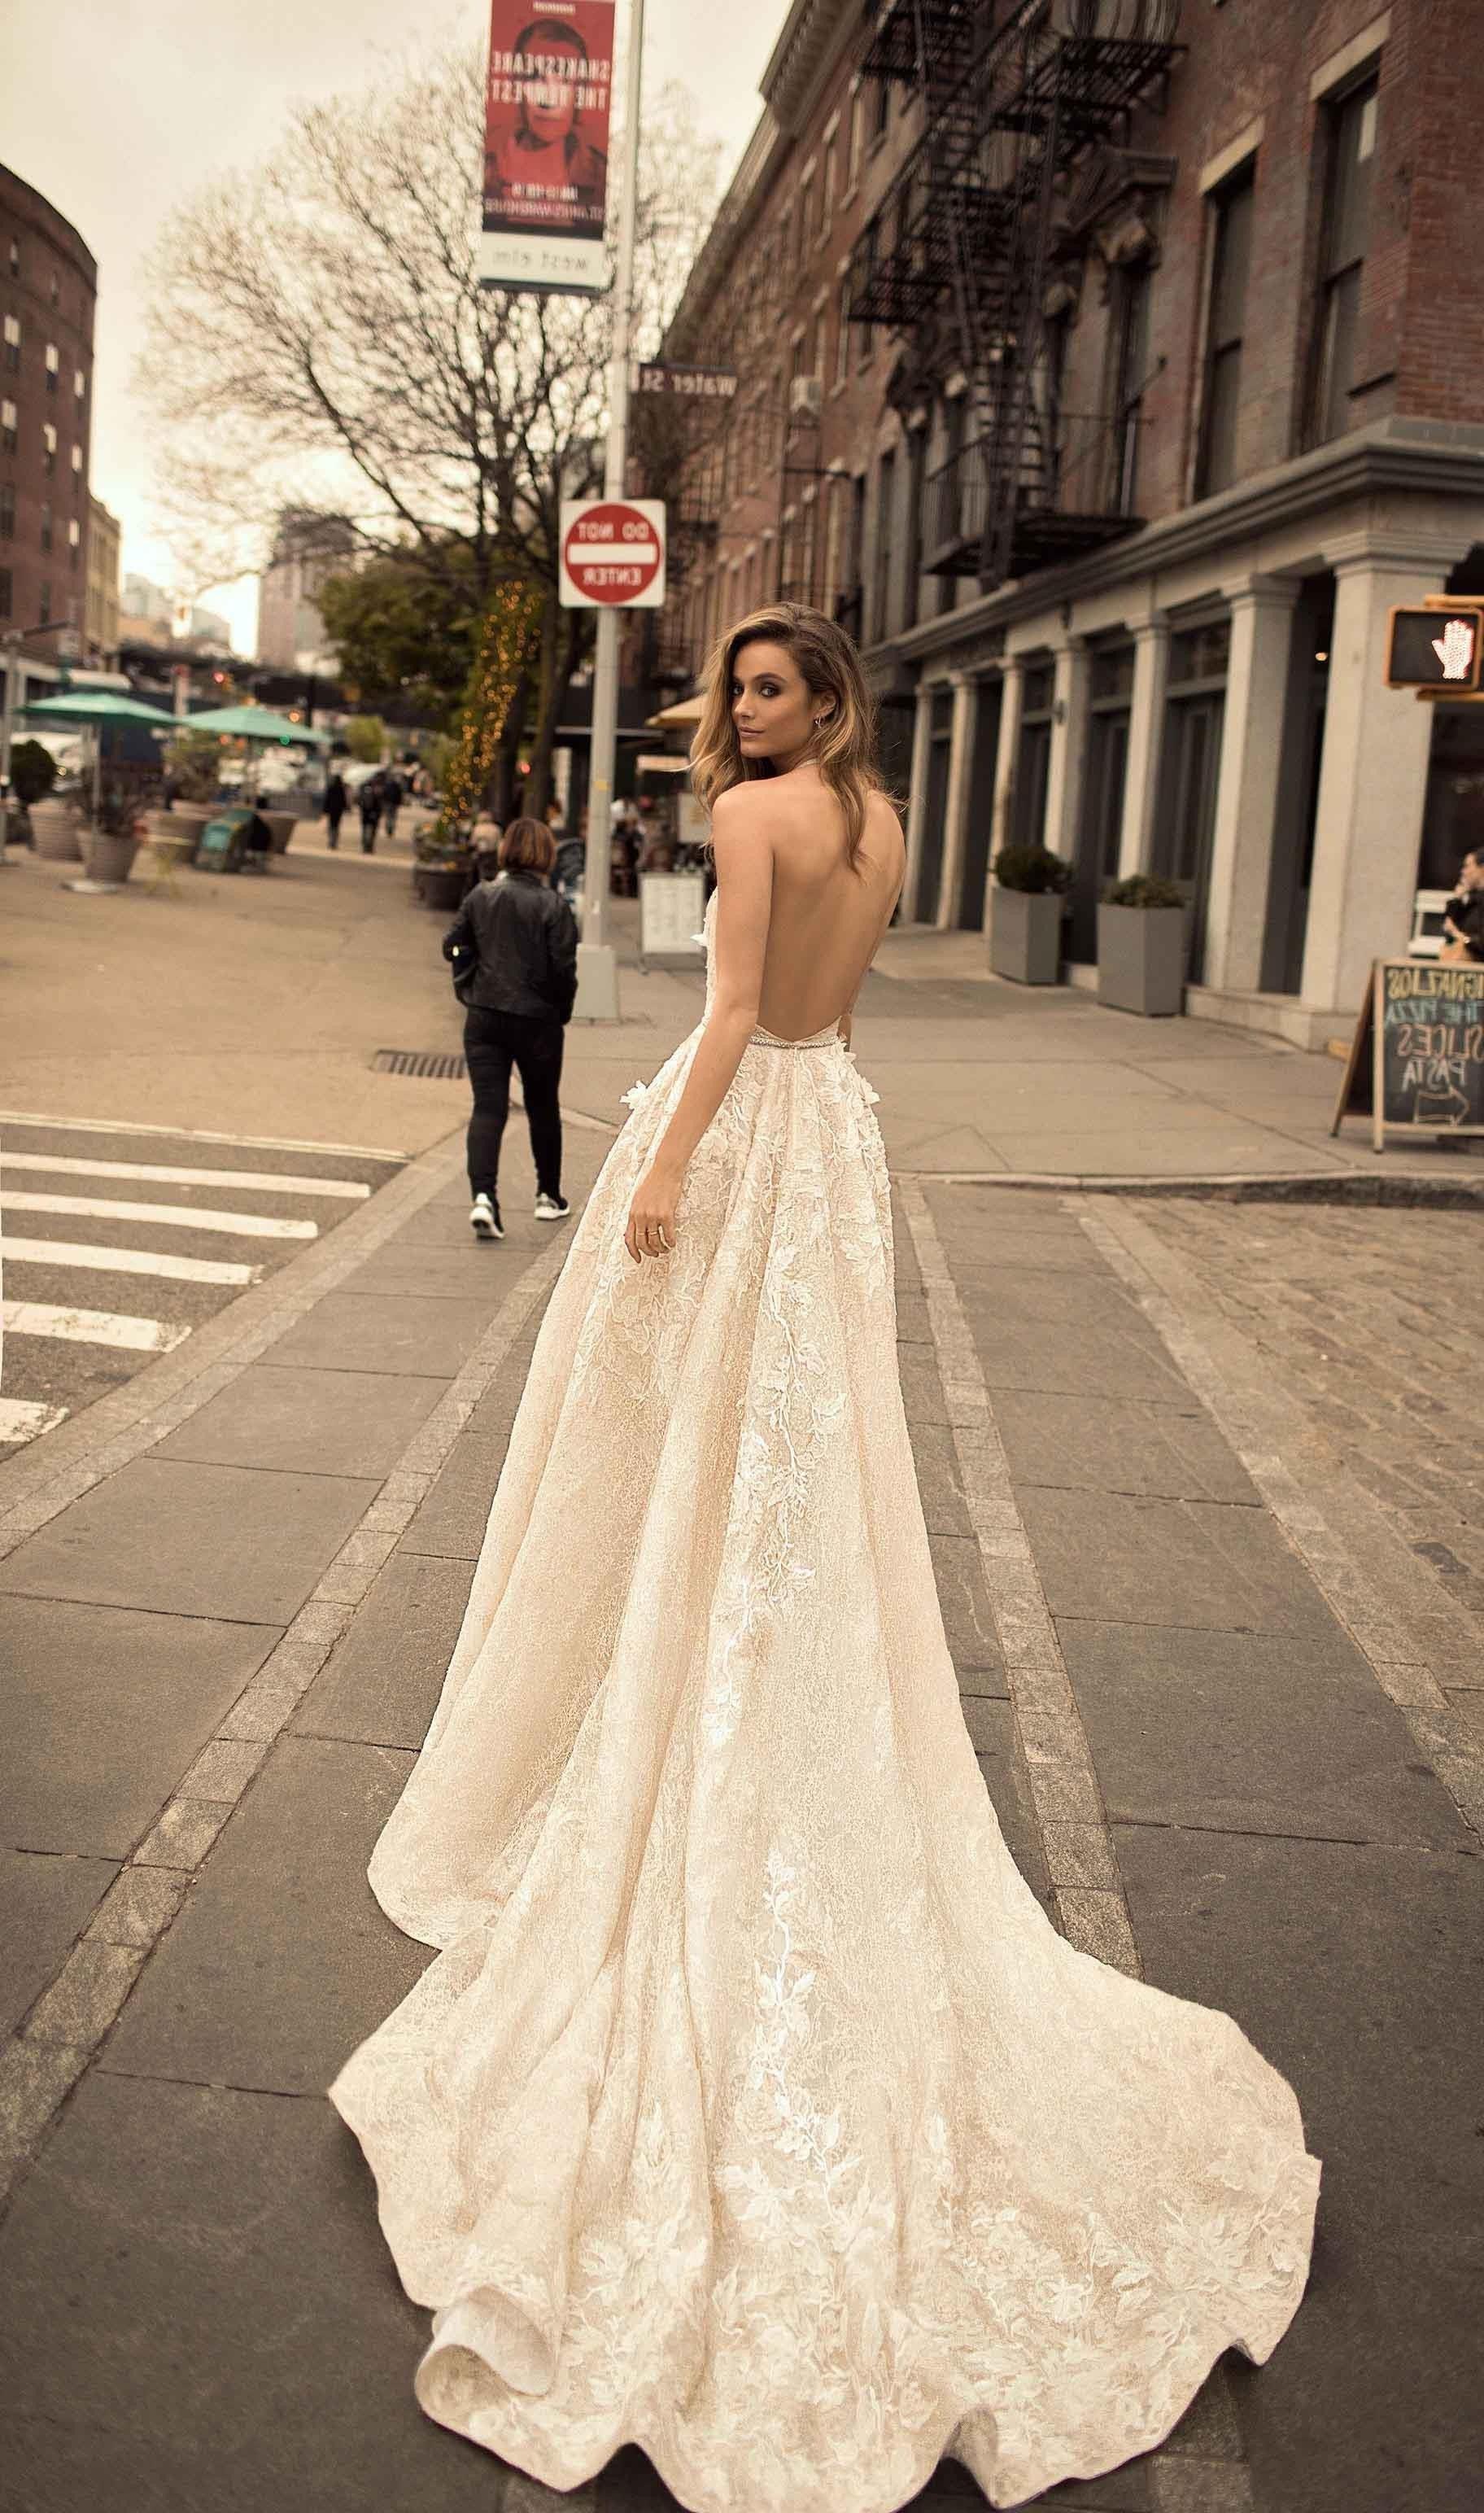 Model Bridesmaid Hijab Kvdd Wedding Ideas White and Gold Wedding Dress the Newest